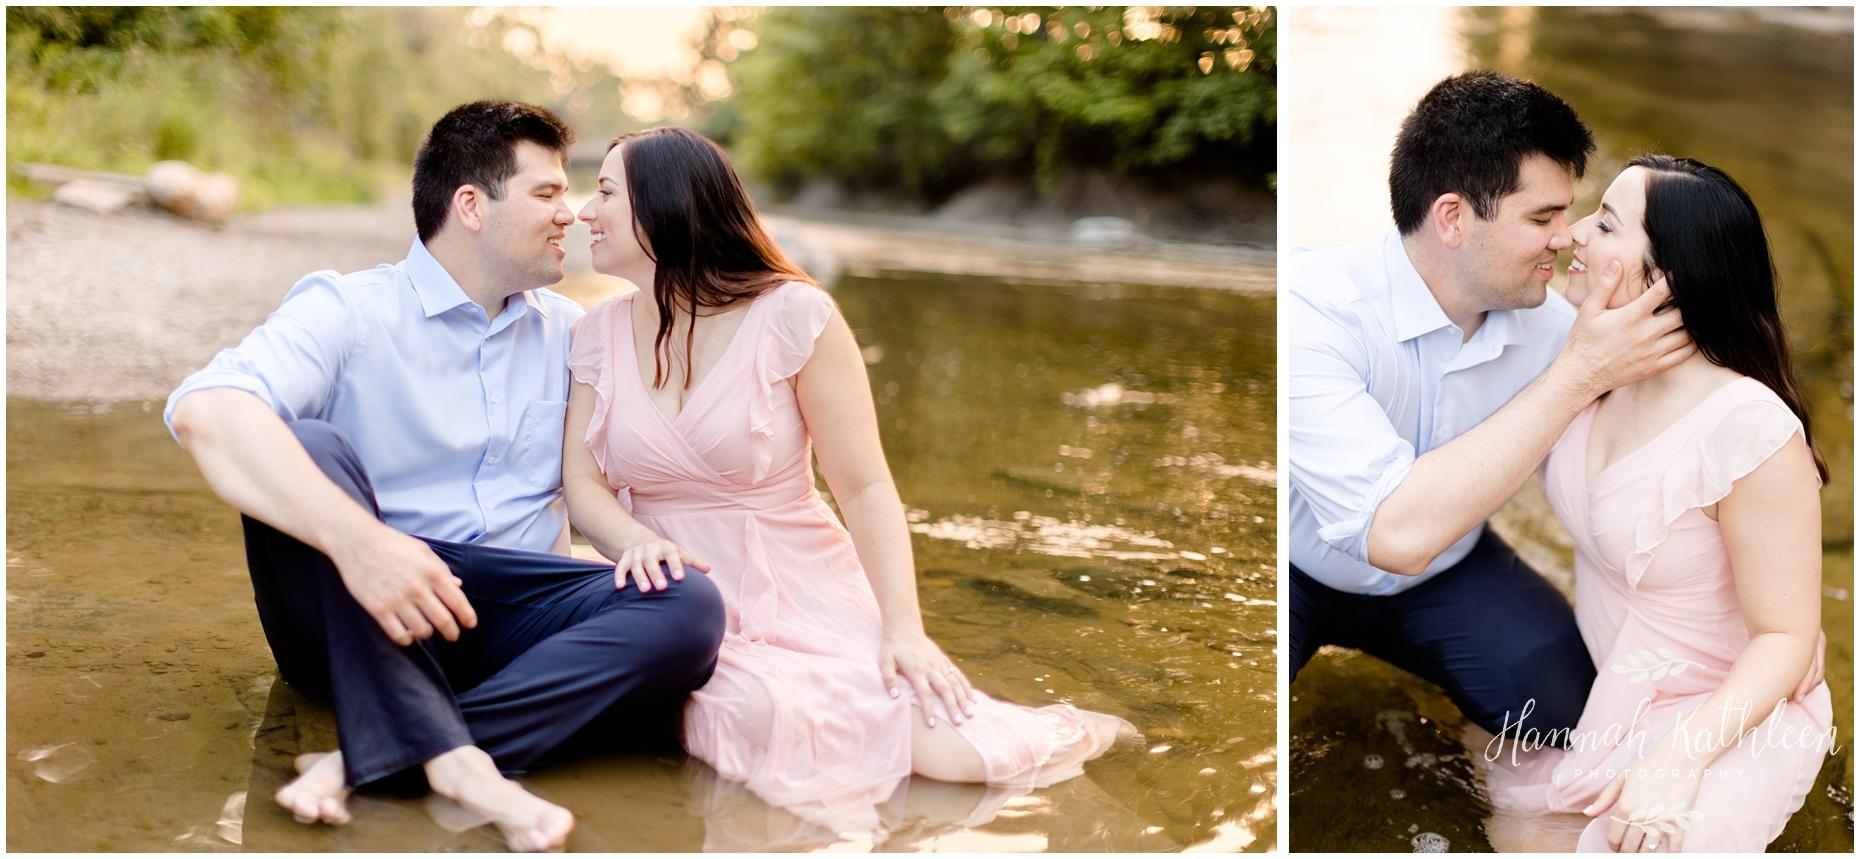 tim-katey-burchfield-creek-buffalo-ny-dogs-engagement-session-photographer